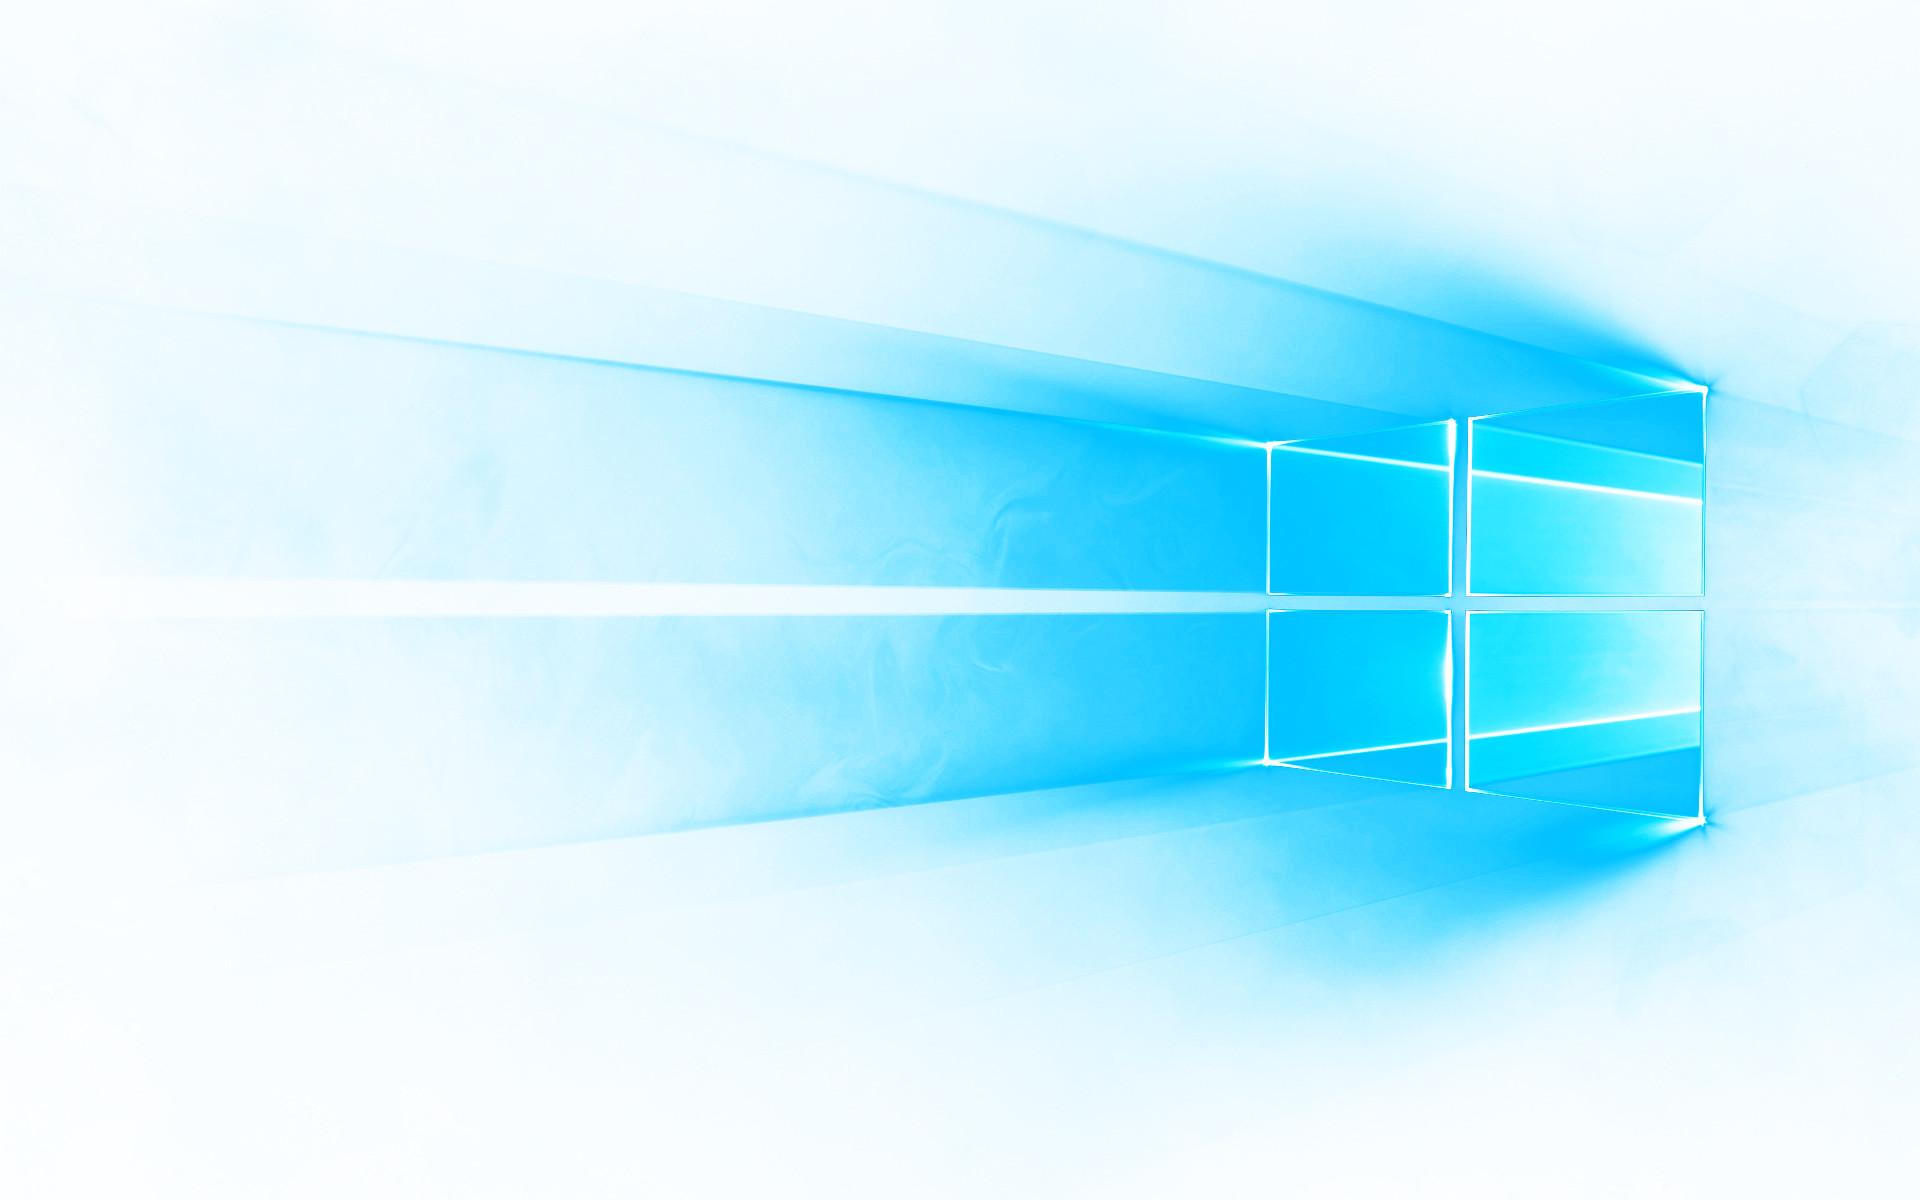 Windows 10 Hero Wallpaper HD (70+ Images